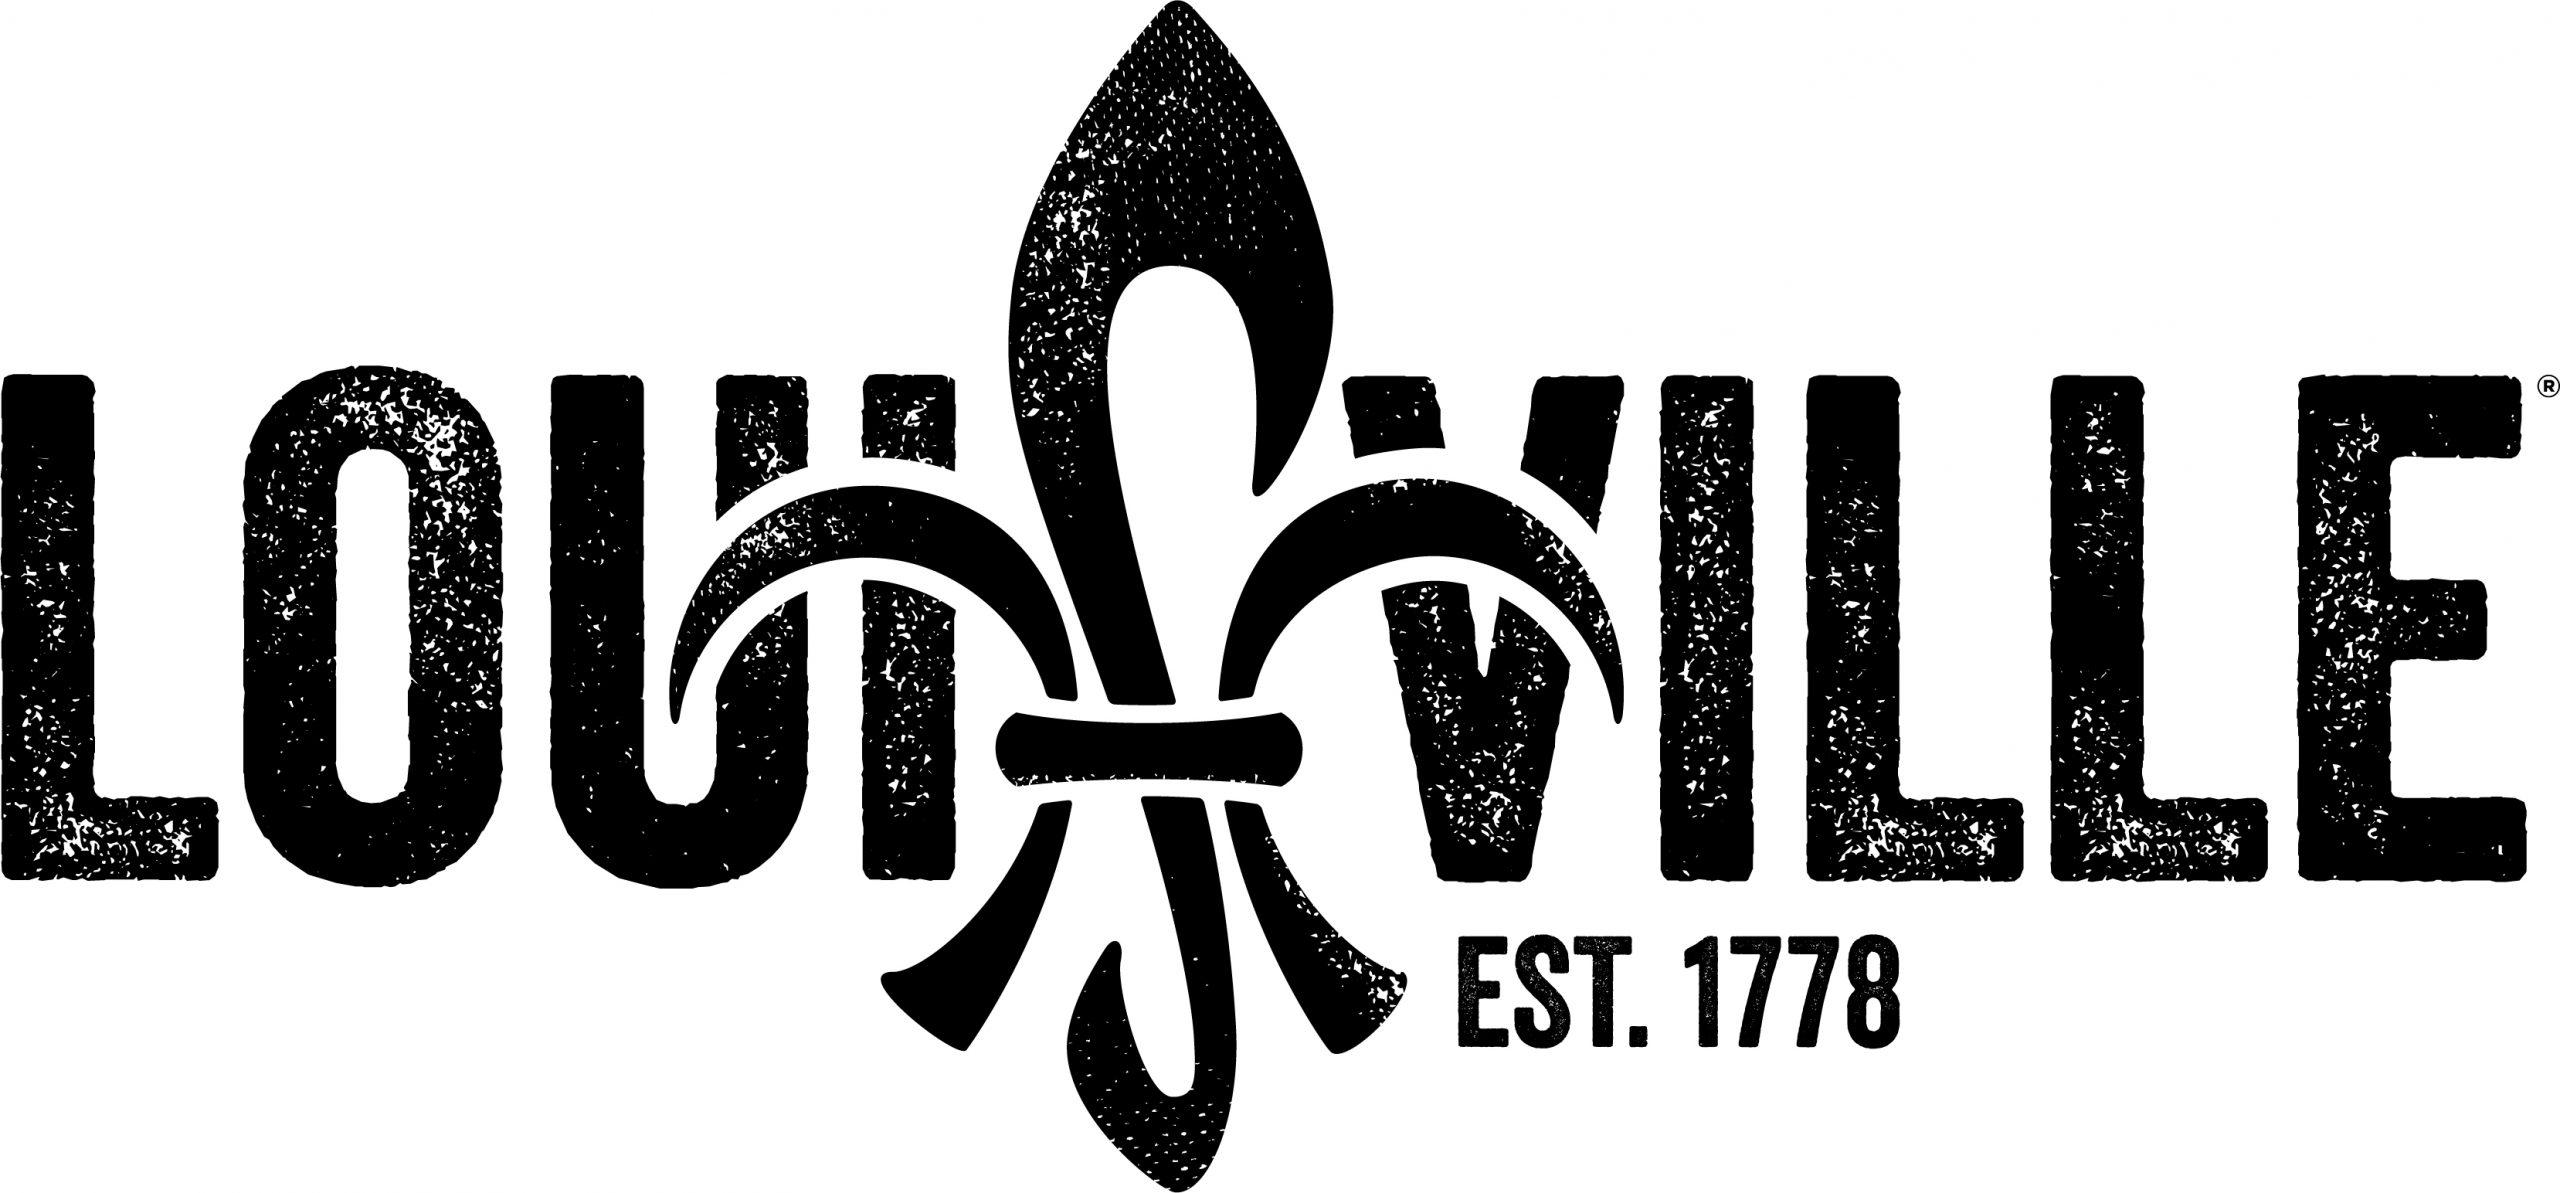 Louisville Tourism